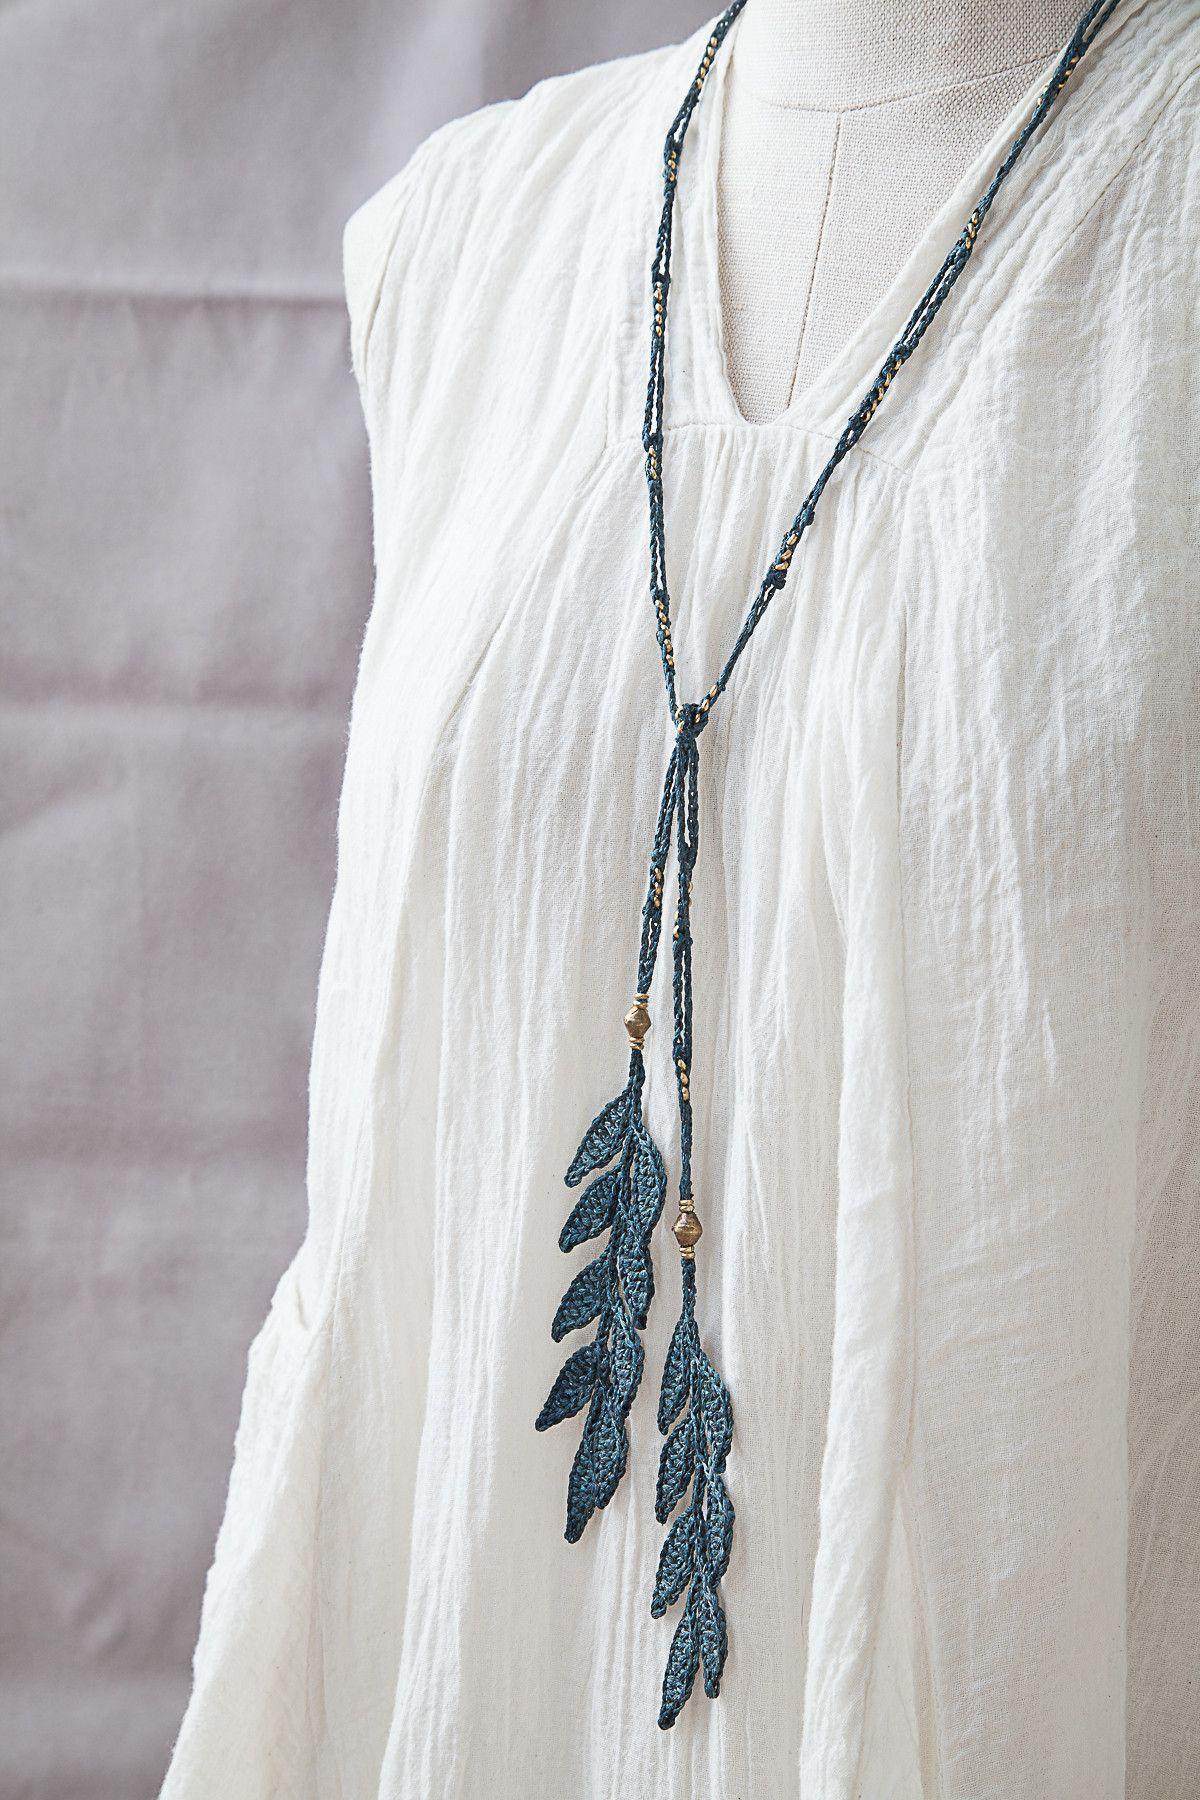 Collar largo | oya iki | Pinterest | Collares, Collares largos y ...